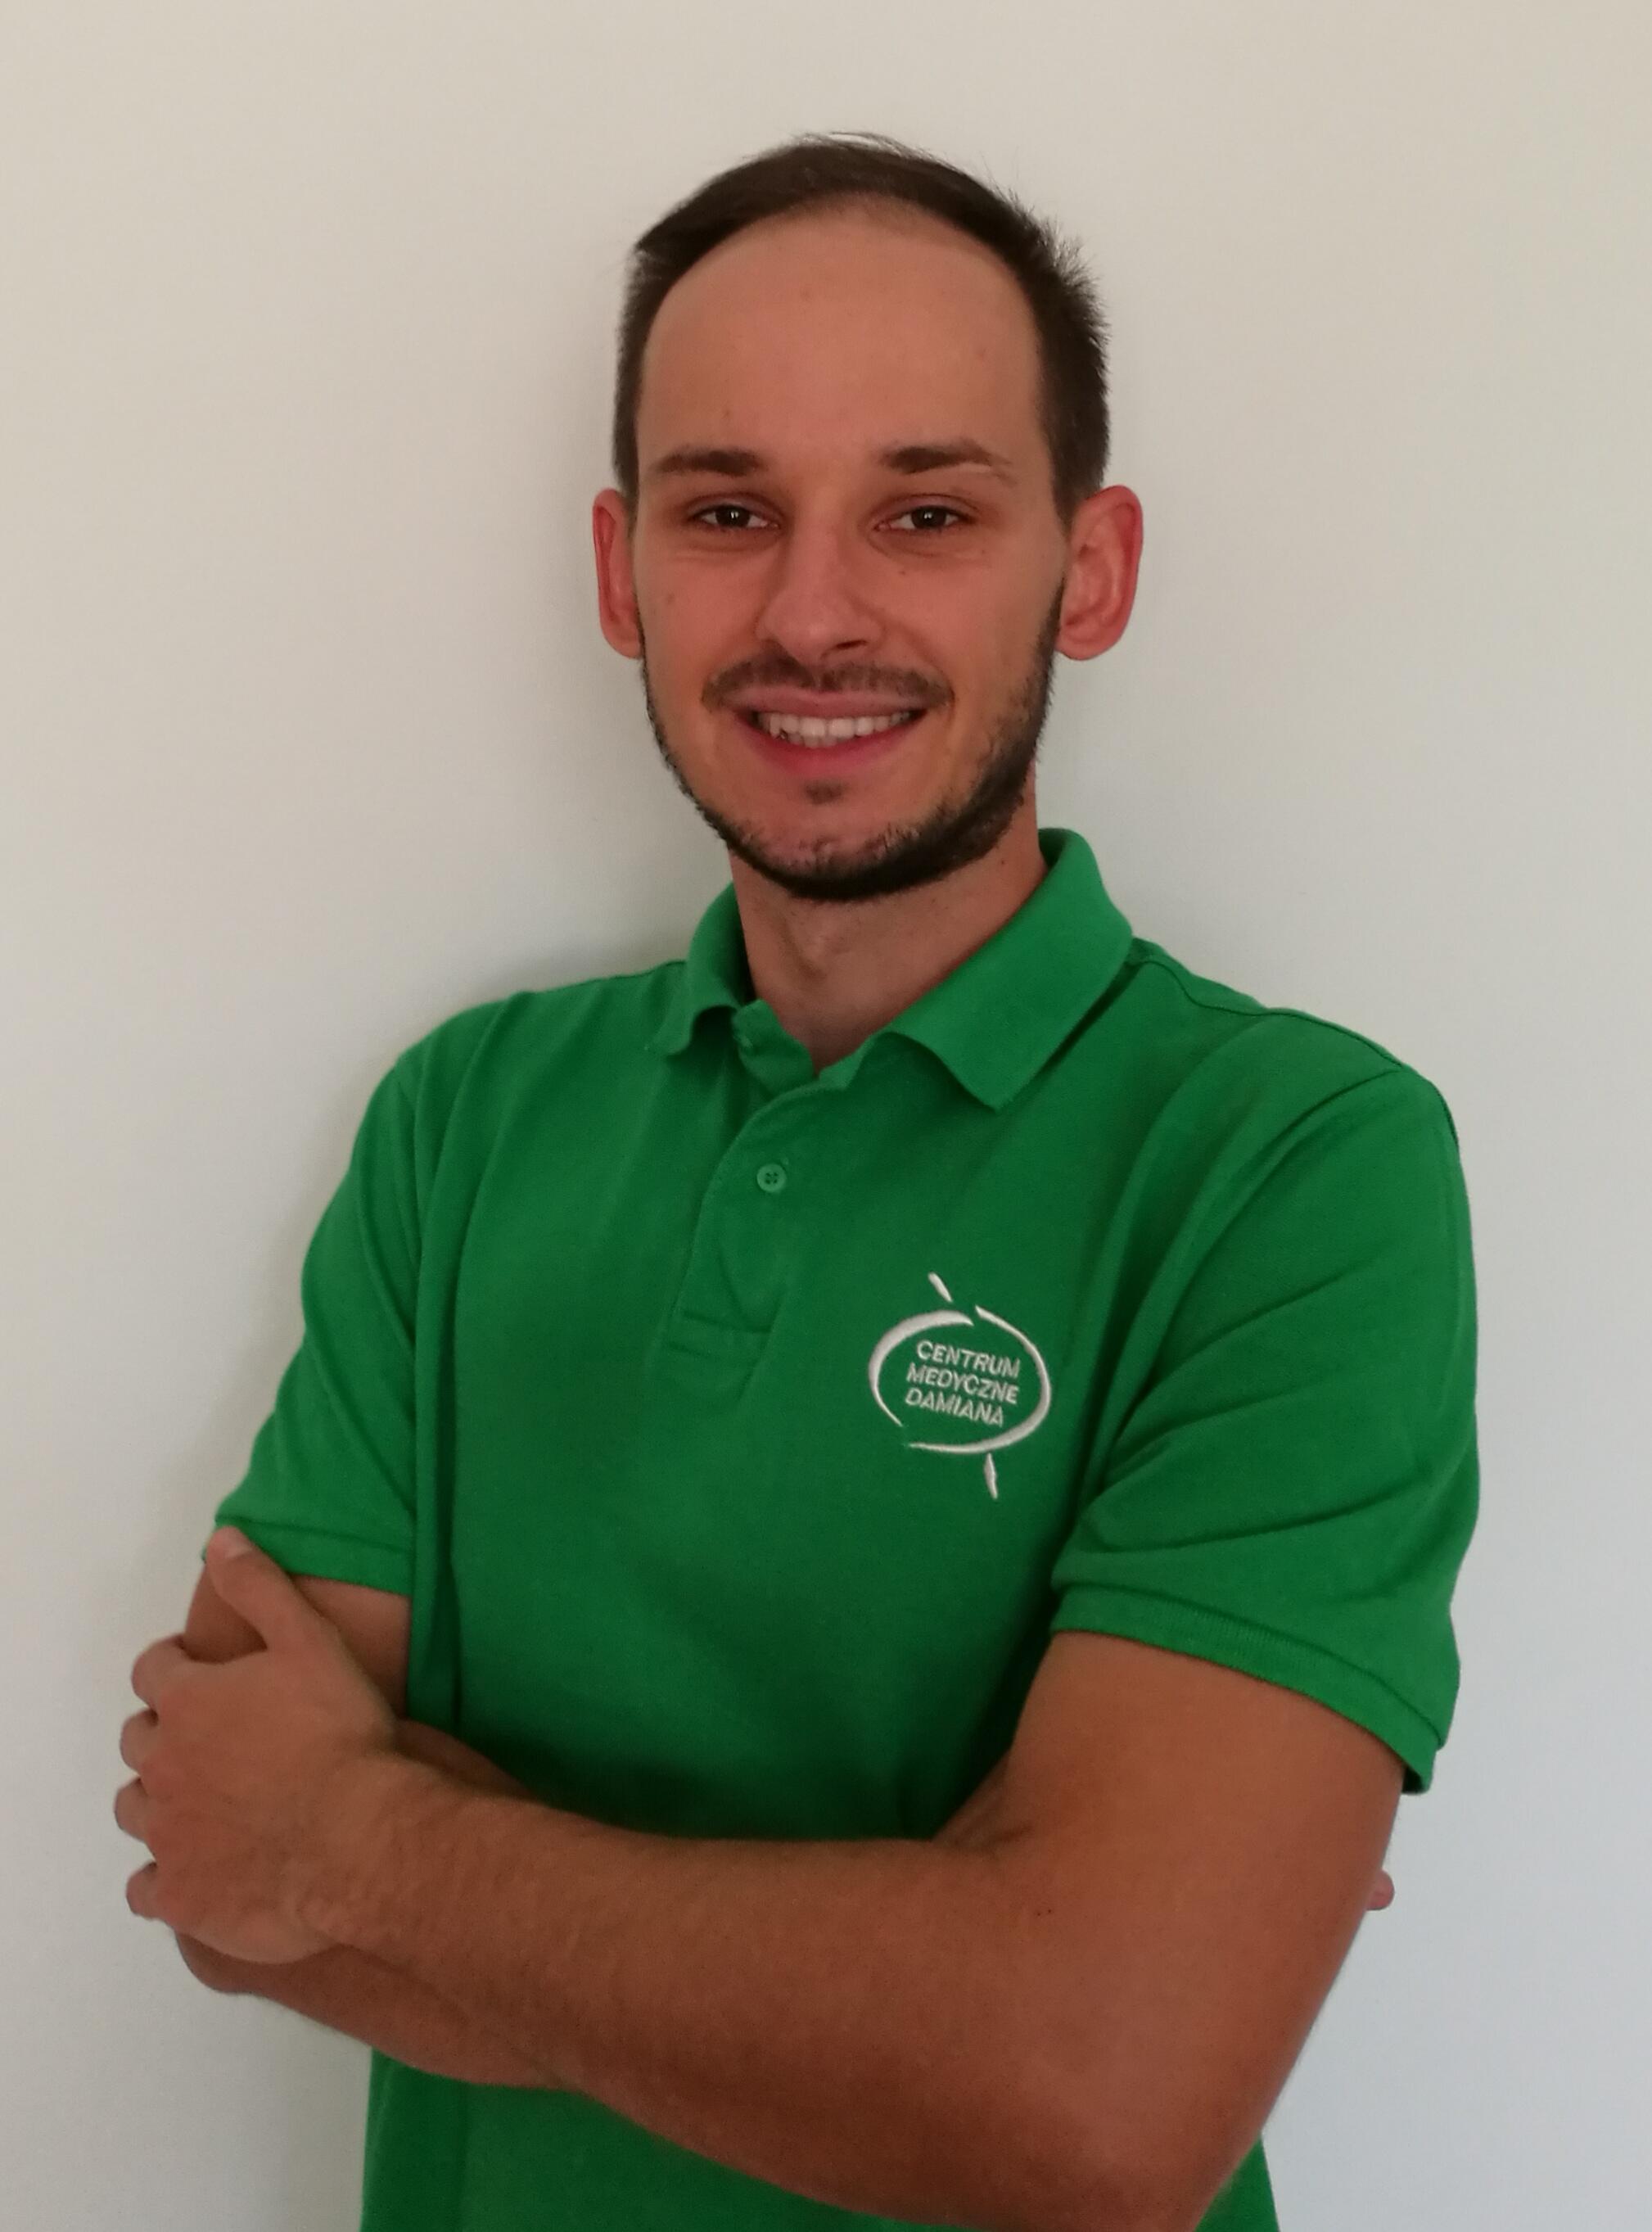 fizjoterapeuta Mateusz Dul (fot. materiały prasowe)